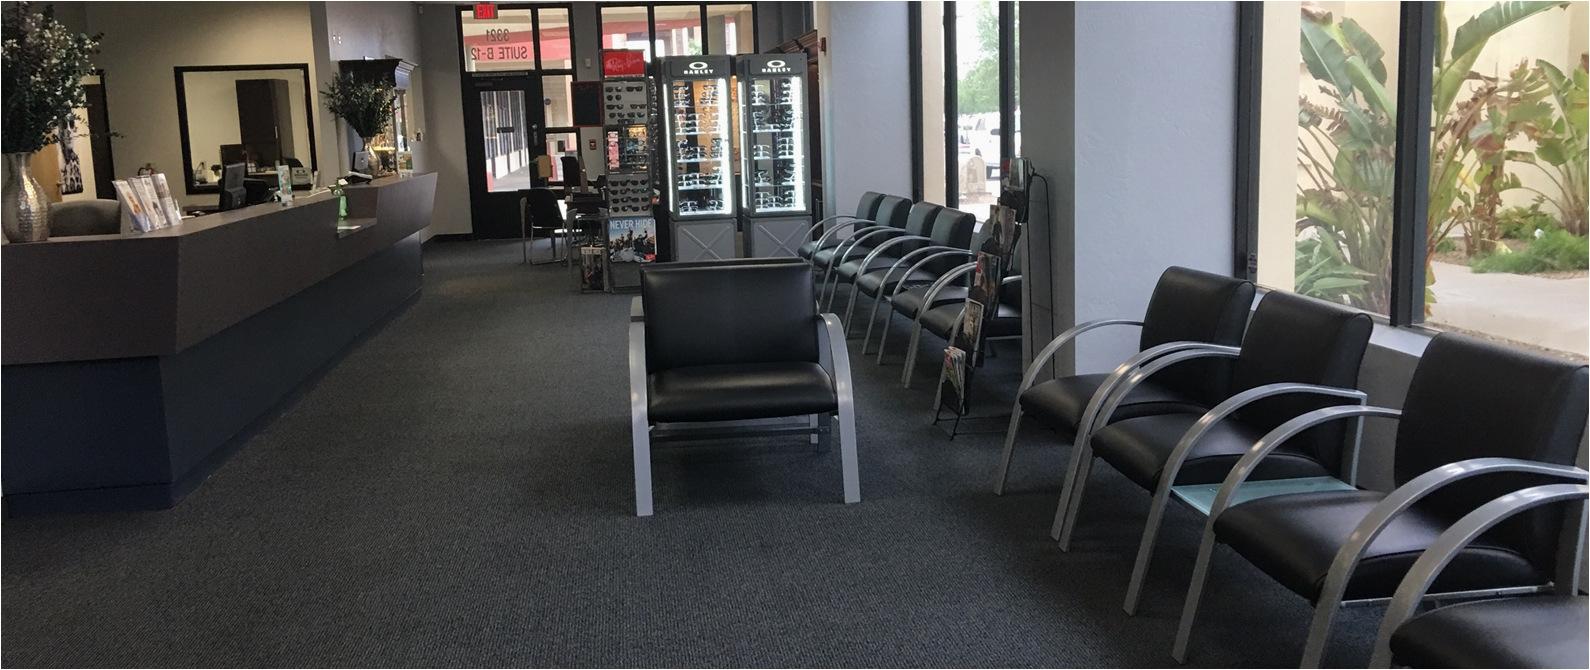 mor furniture for less phoenix az fresh home eye doctors of arizona phoenix az pictures of